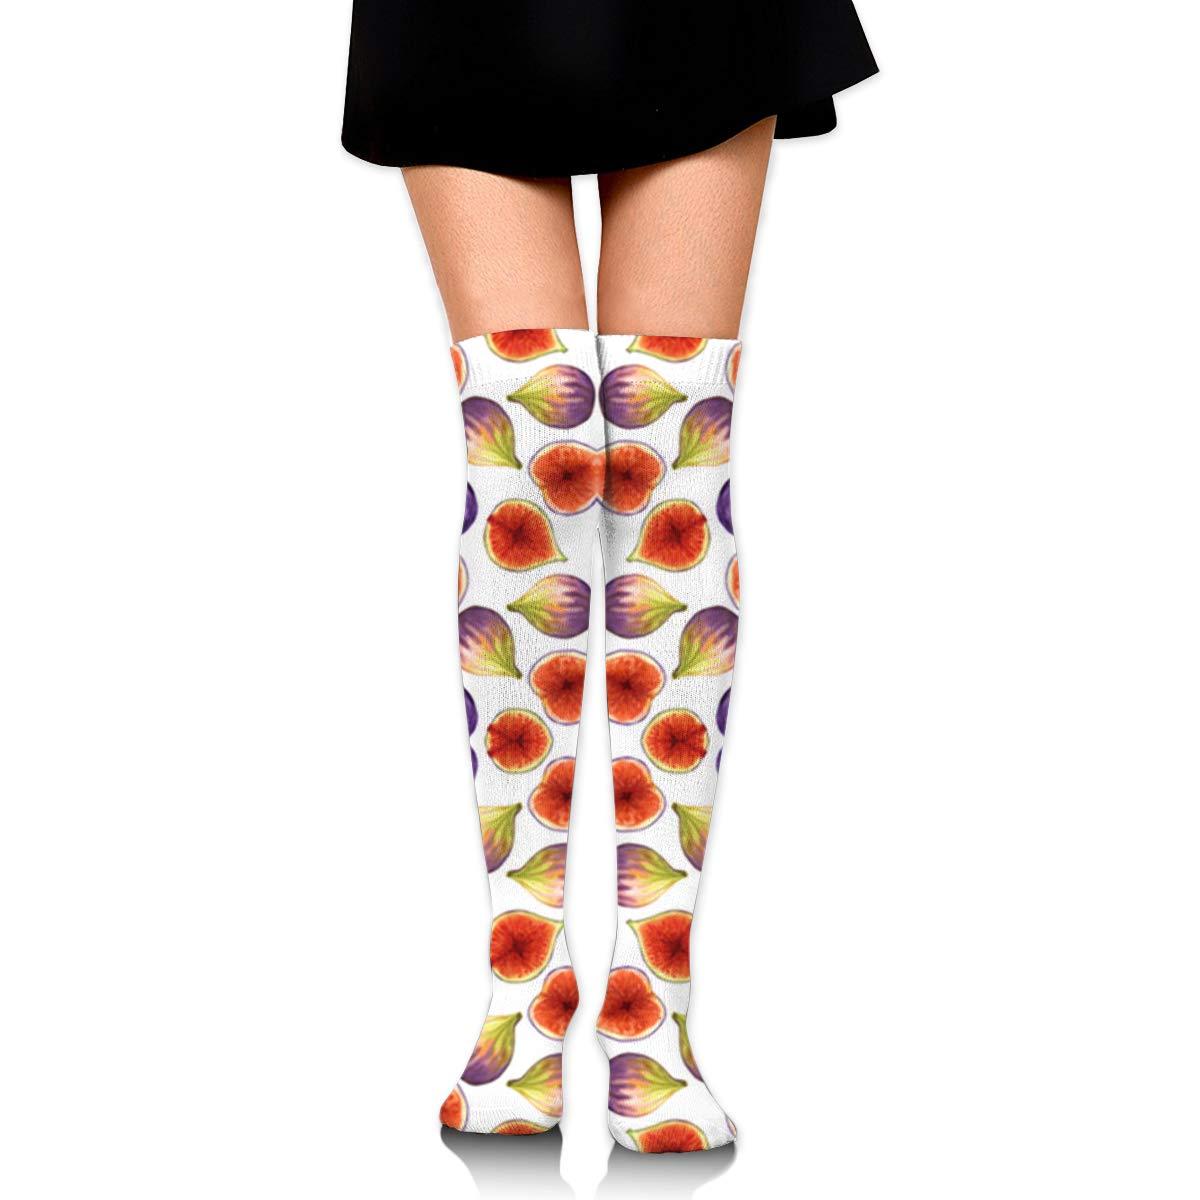 Women's Knee High Socks Long Tube Stockings Huadduo Figs Pink